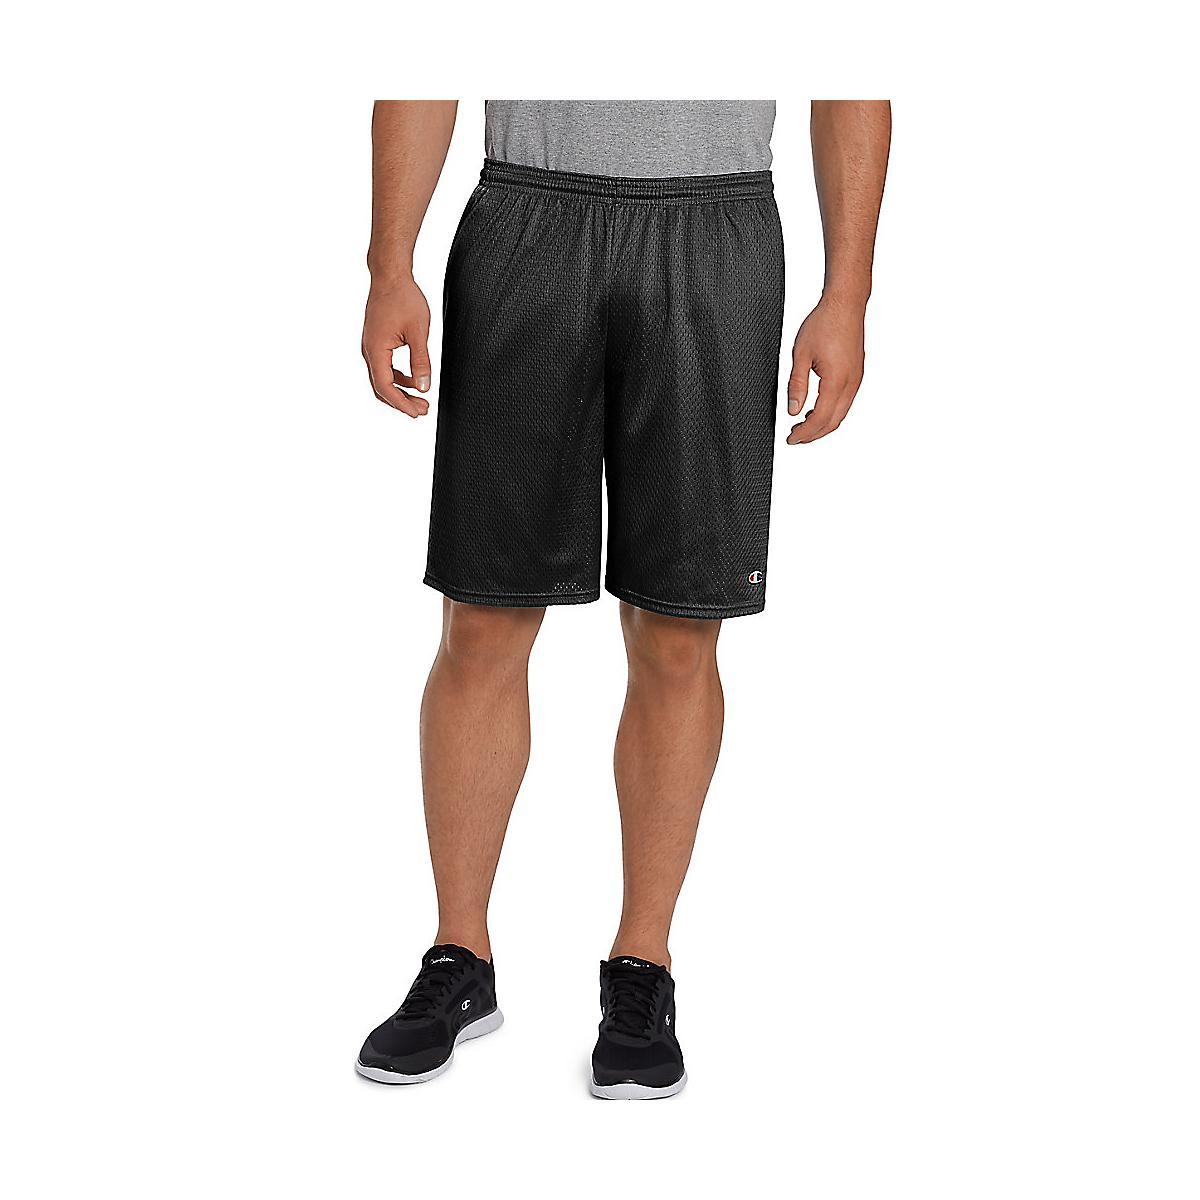 da7767fec937 Mens Champion Long Mesh with Pockets Unlined Shorts at Road Runner Sports